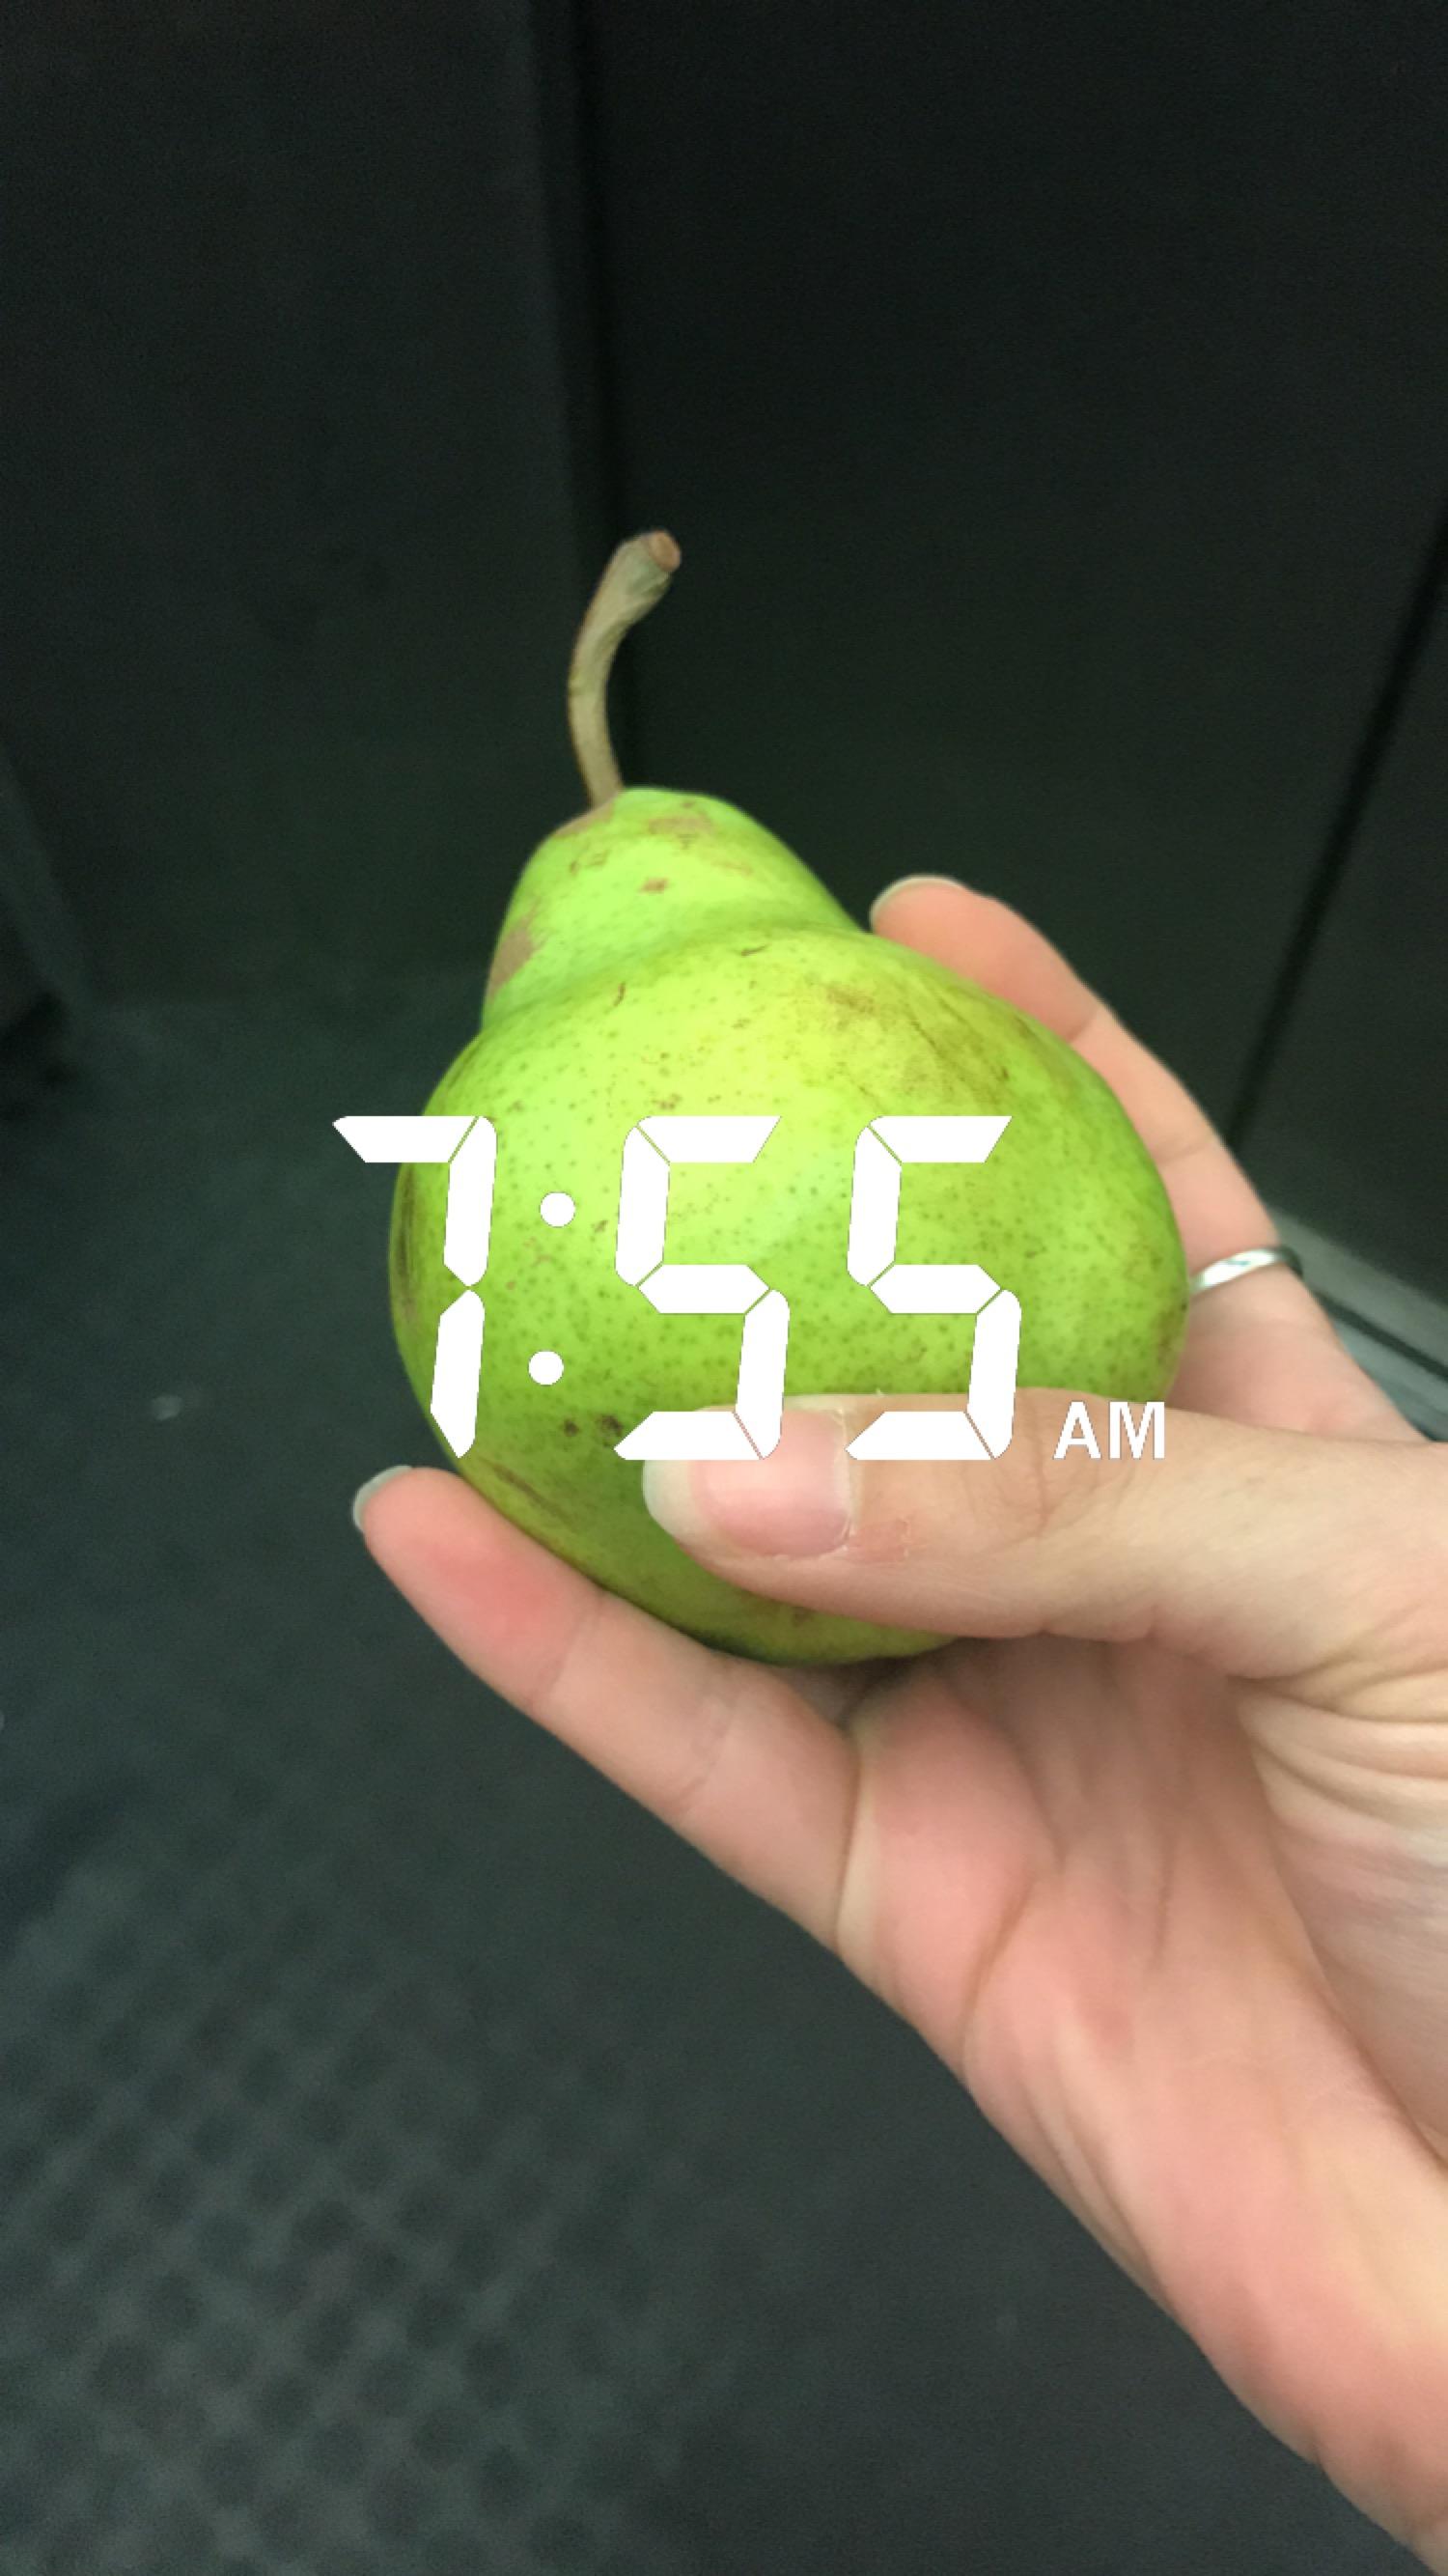 7-55am